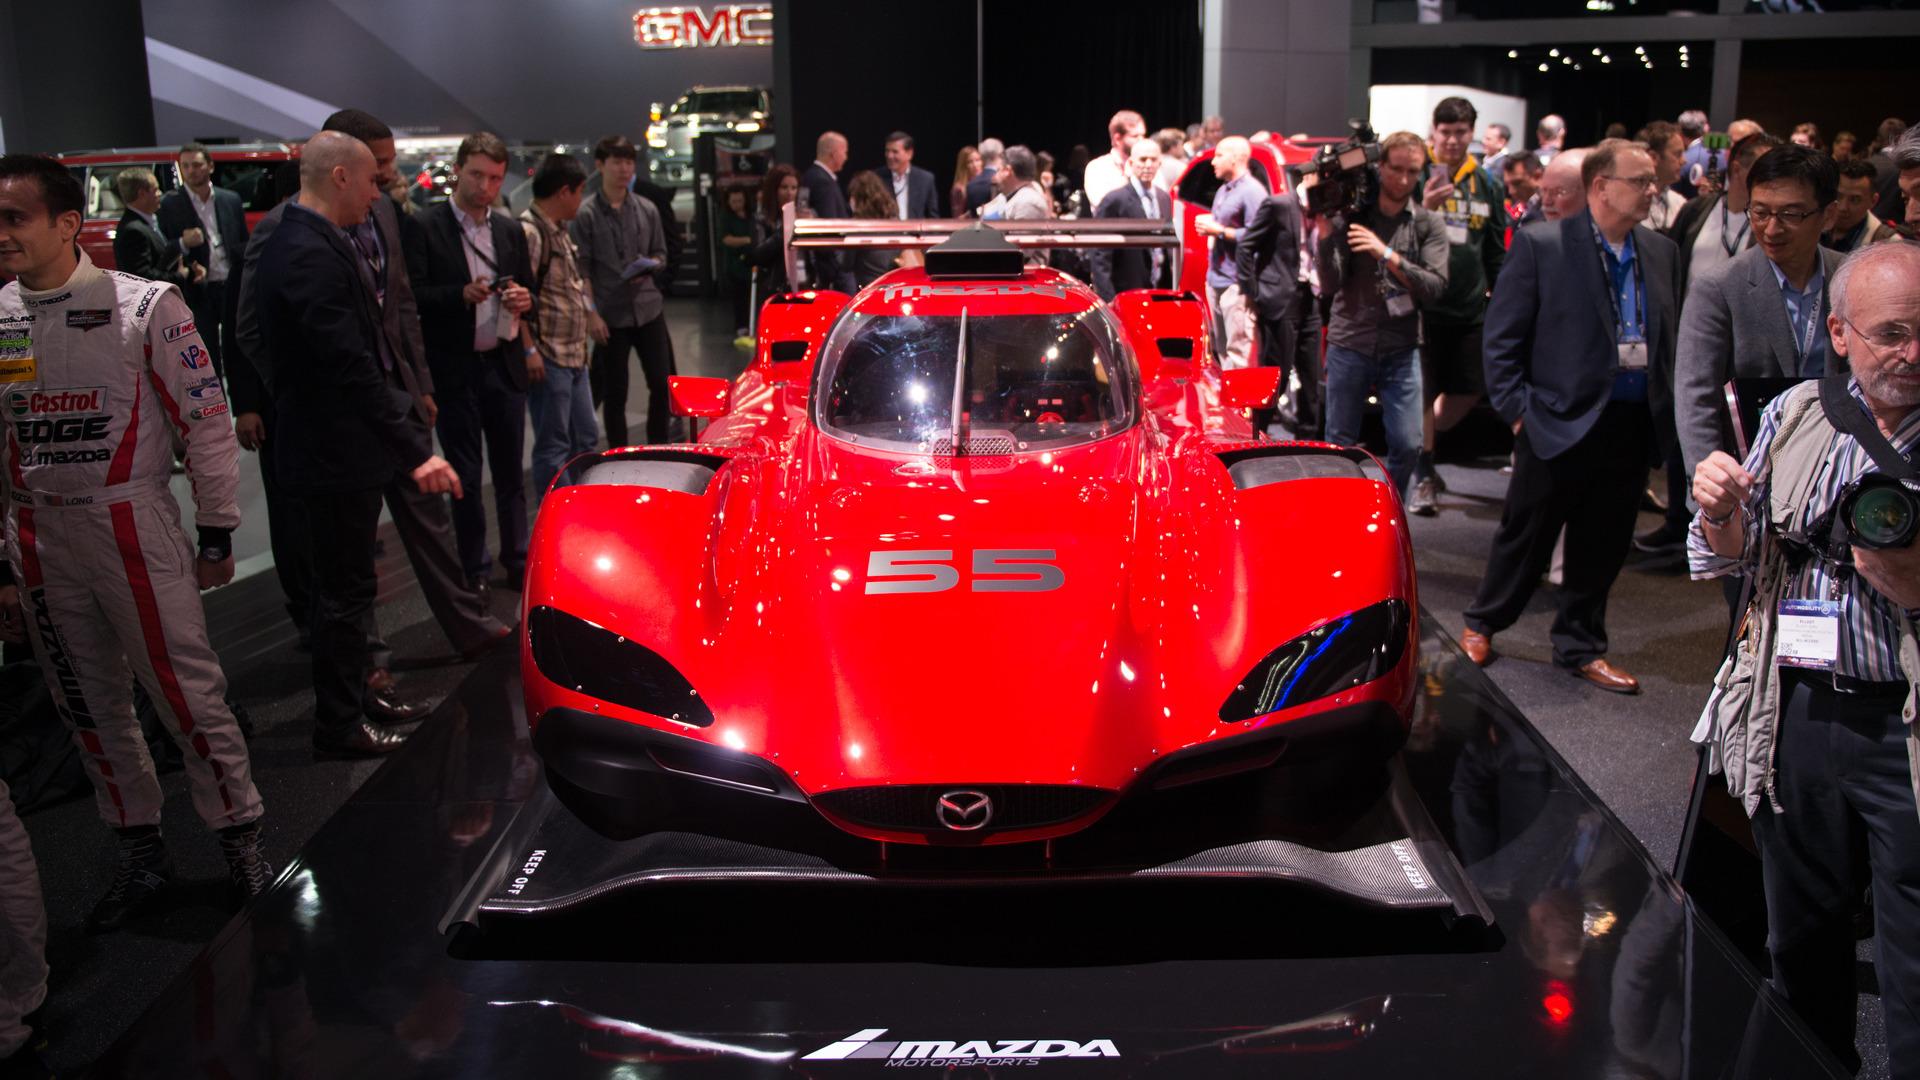 https://icdn-1.motor1.com/images/mgl/vevGq/s1/mazda-rt24-p-race-car-la-2016.jpg